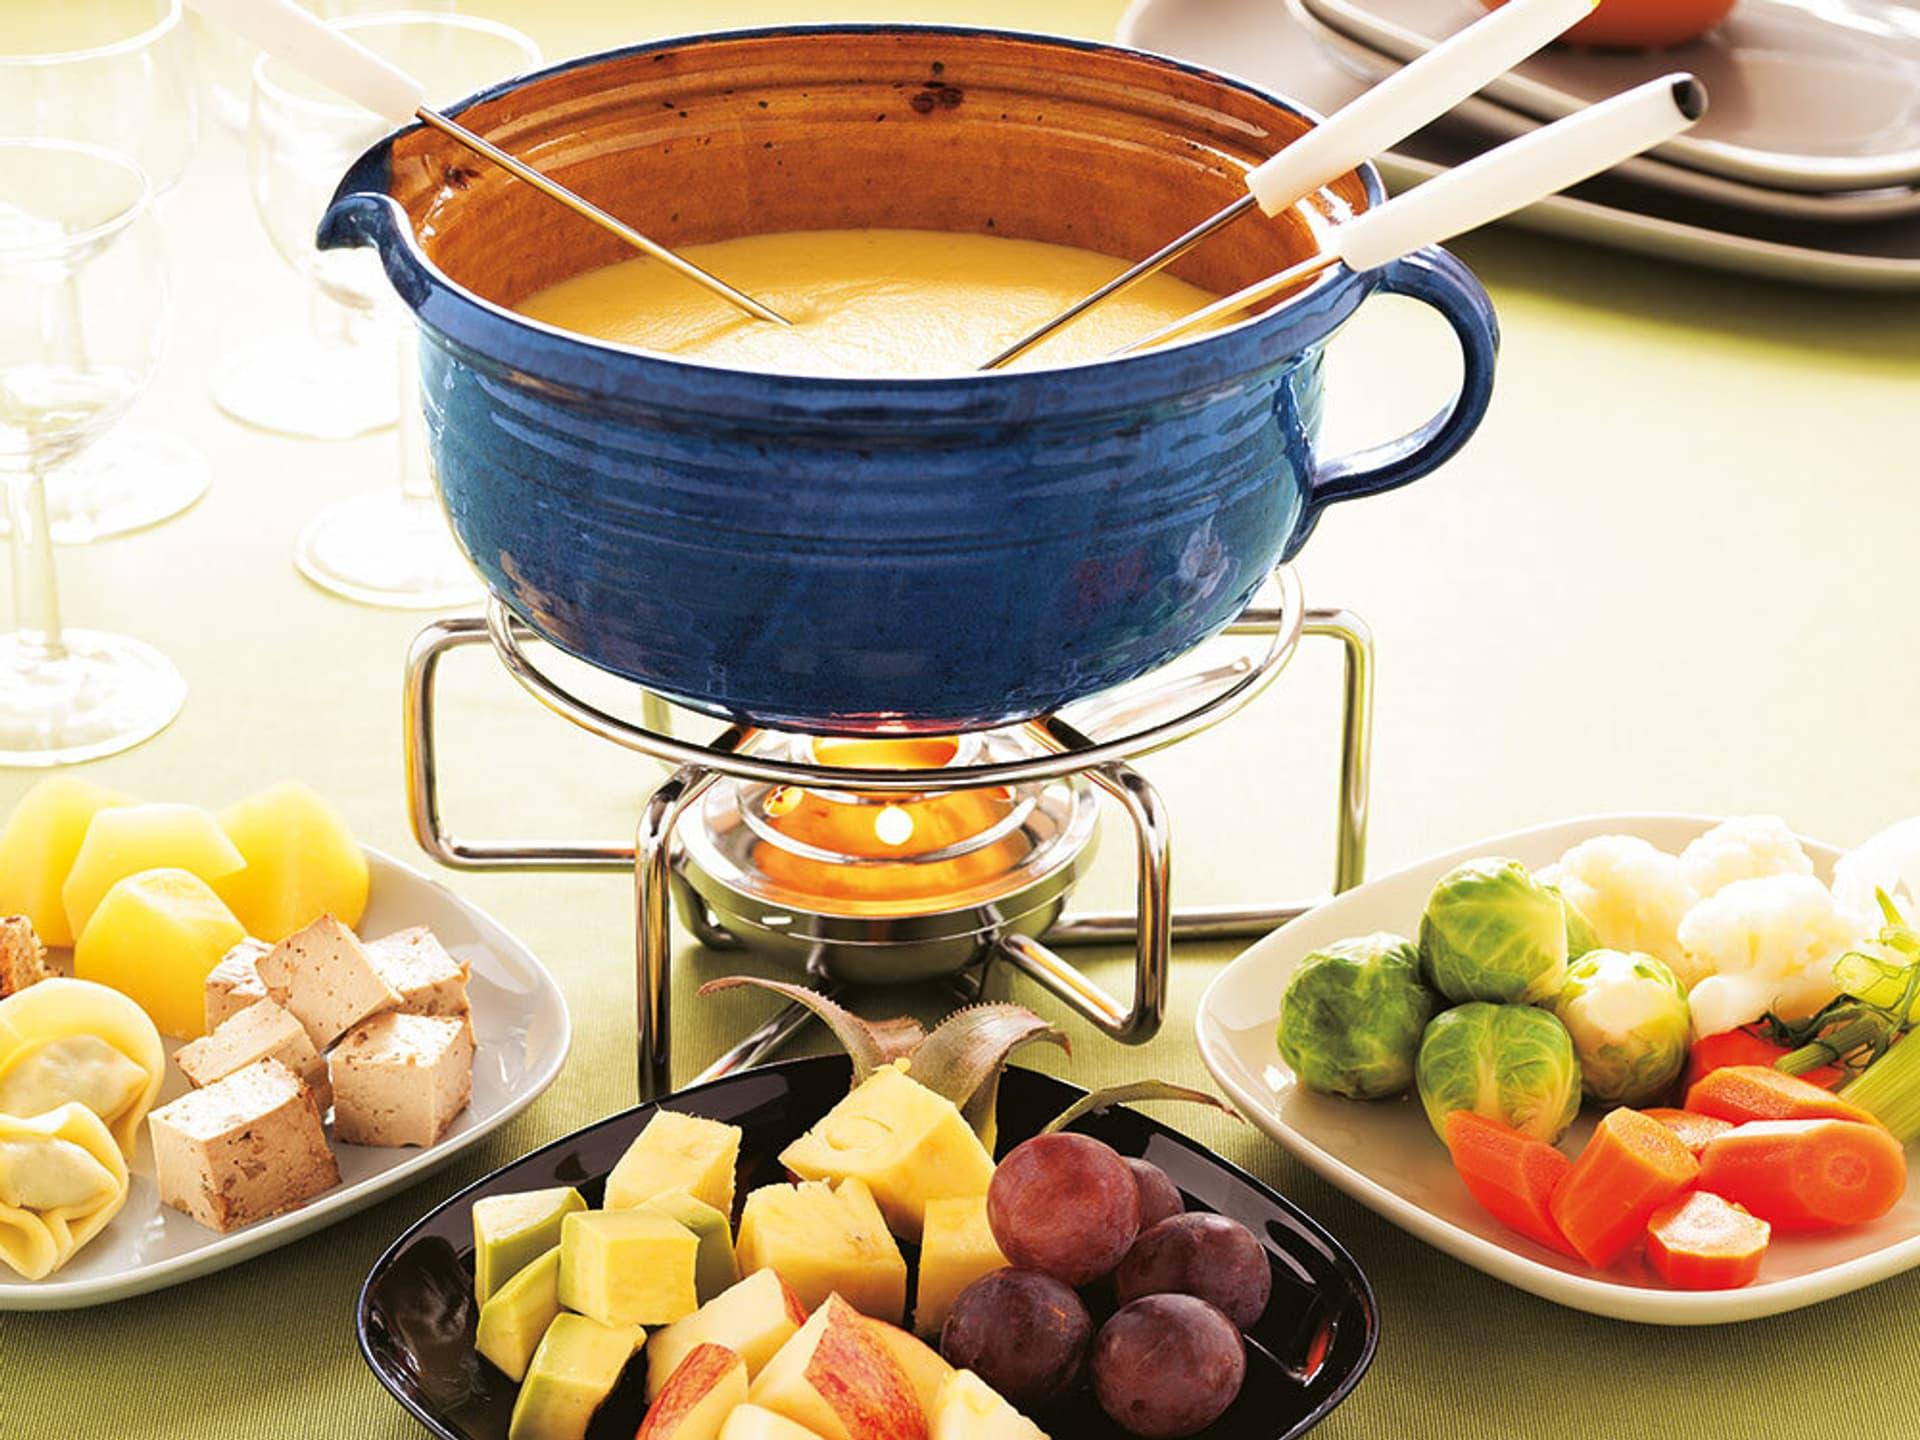 Dreierlei kaese fondue